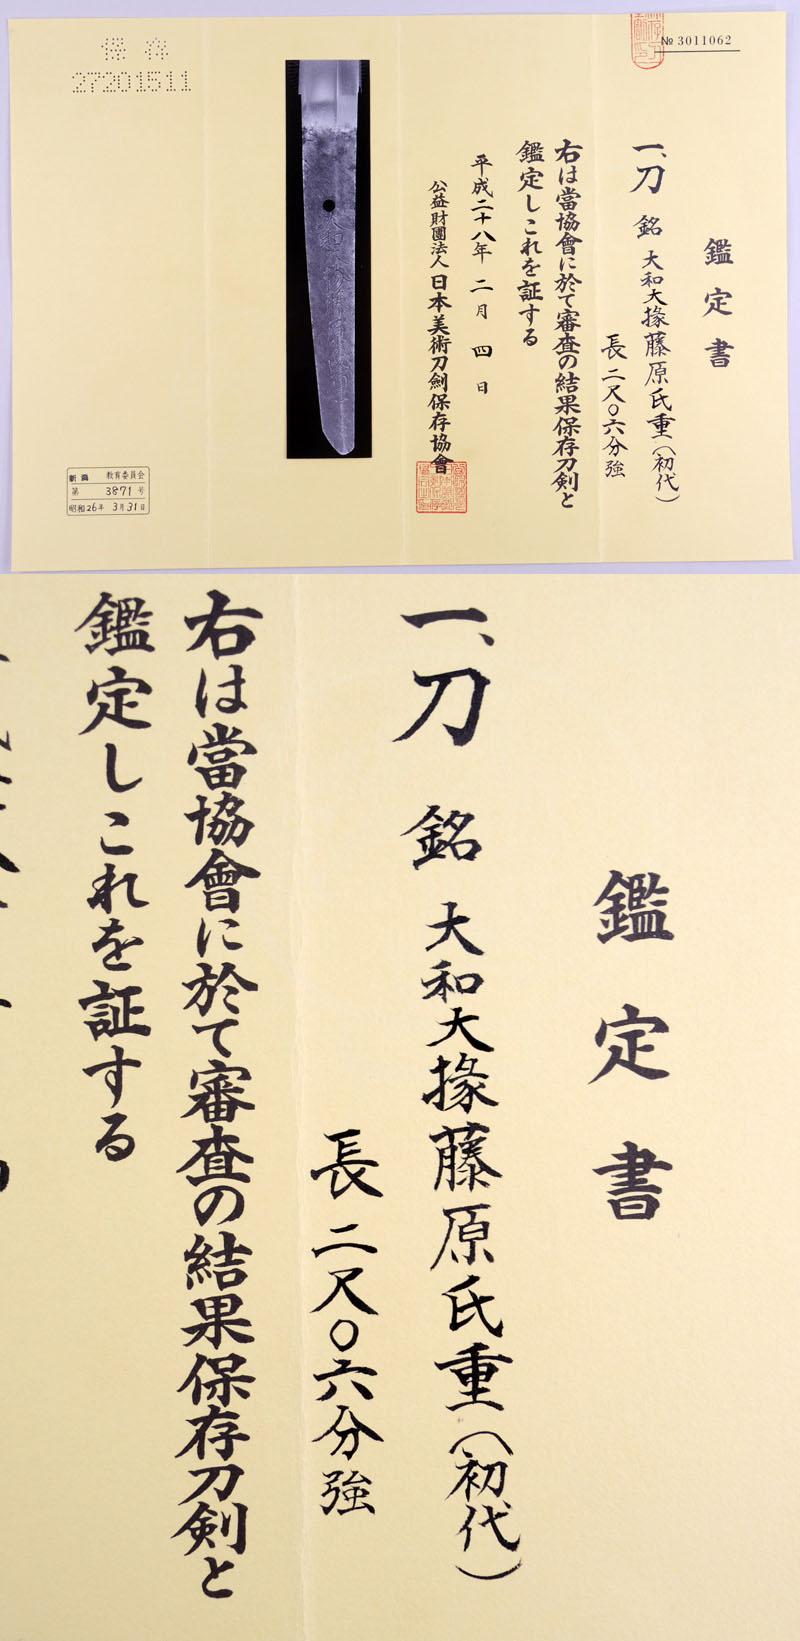 大和大掾藤原氏重(初代) Picture of Certificate